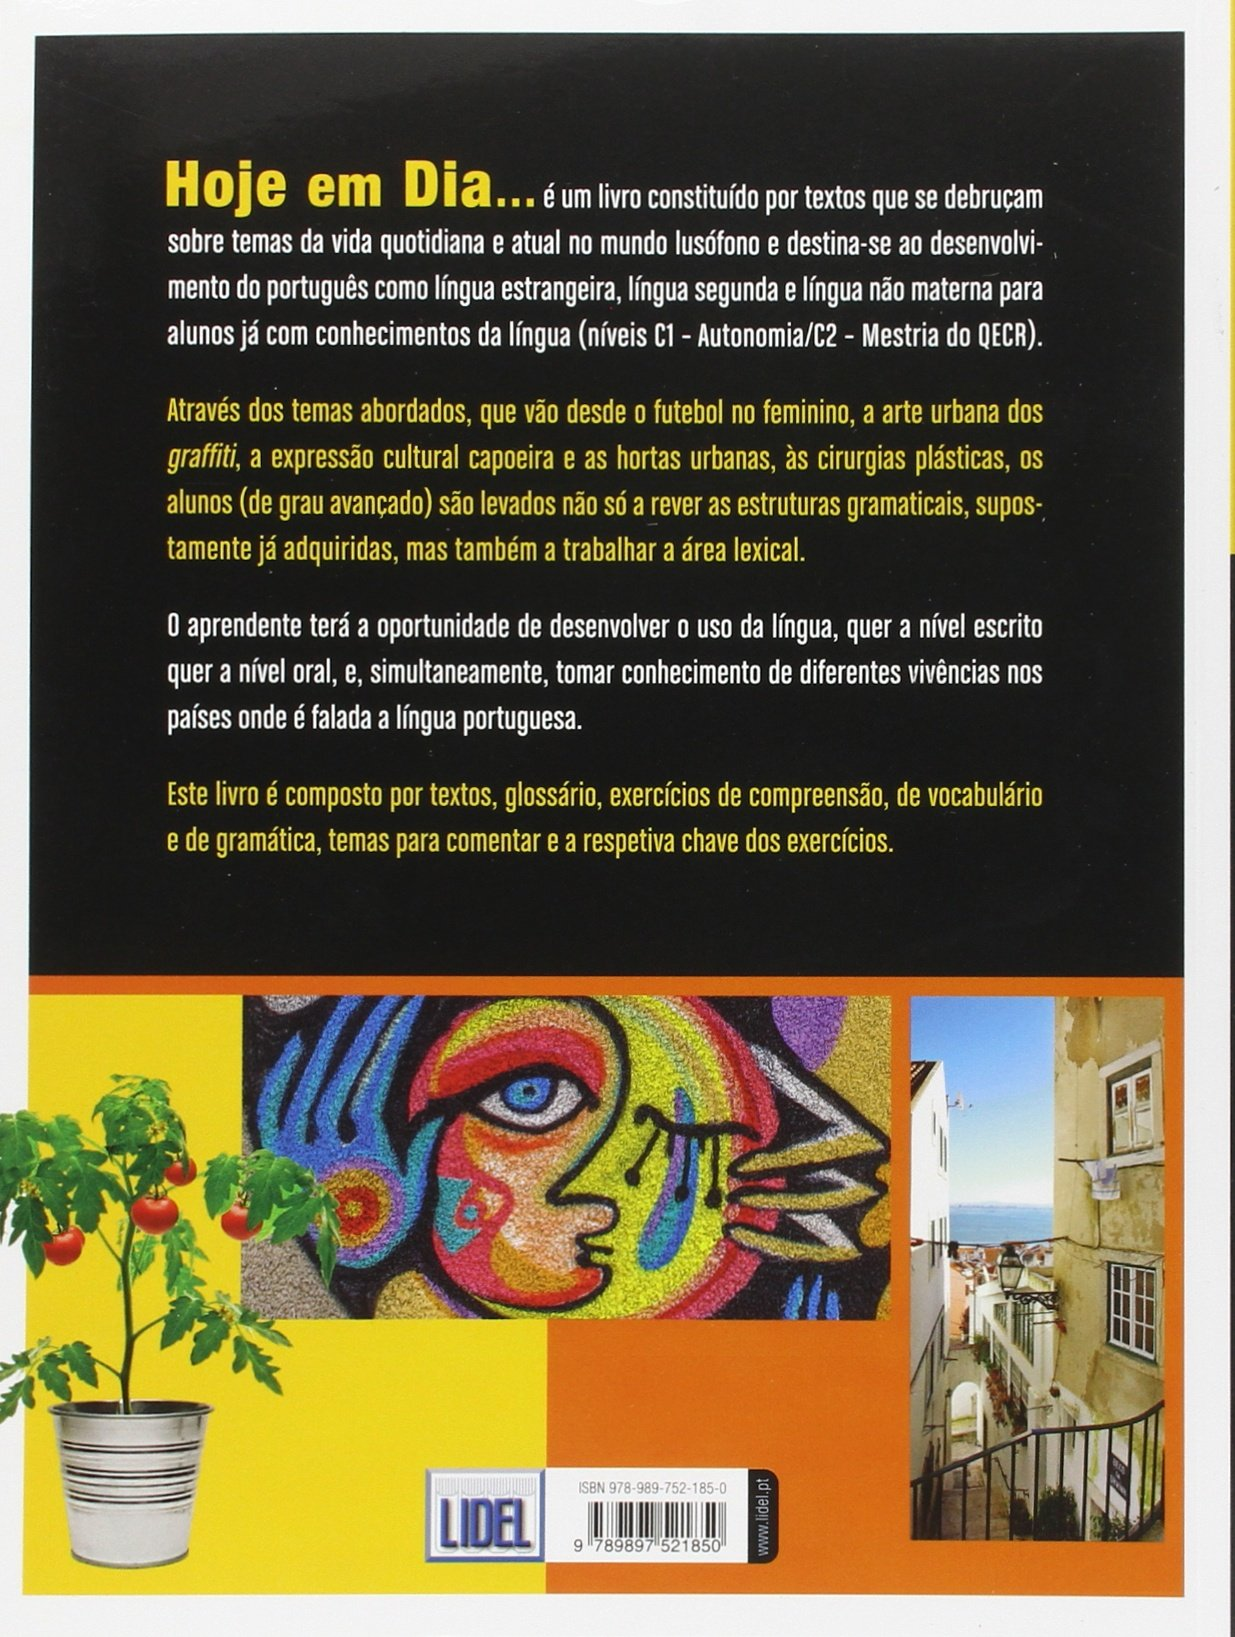 Hoje em dia amazon herminia malcata 9789897521850 books fandeluxe Images